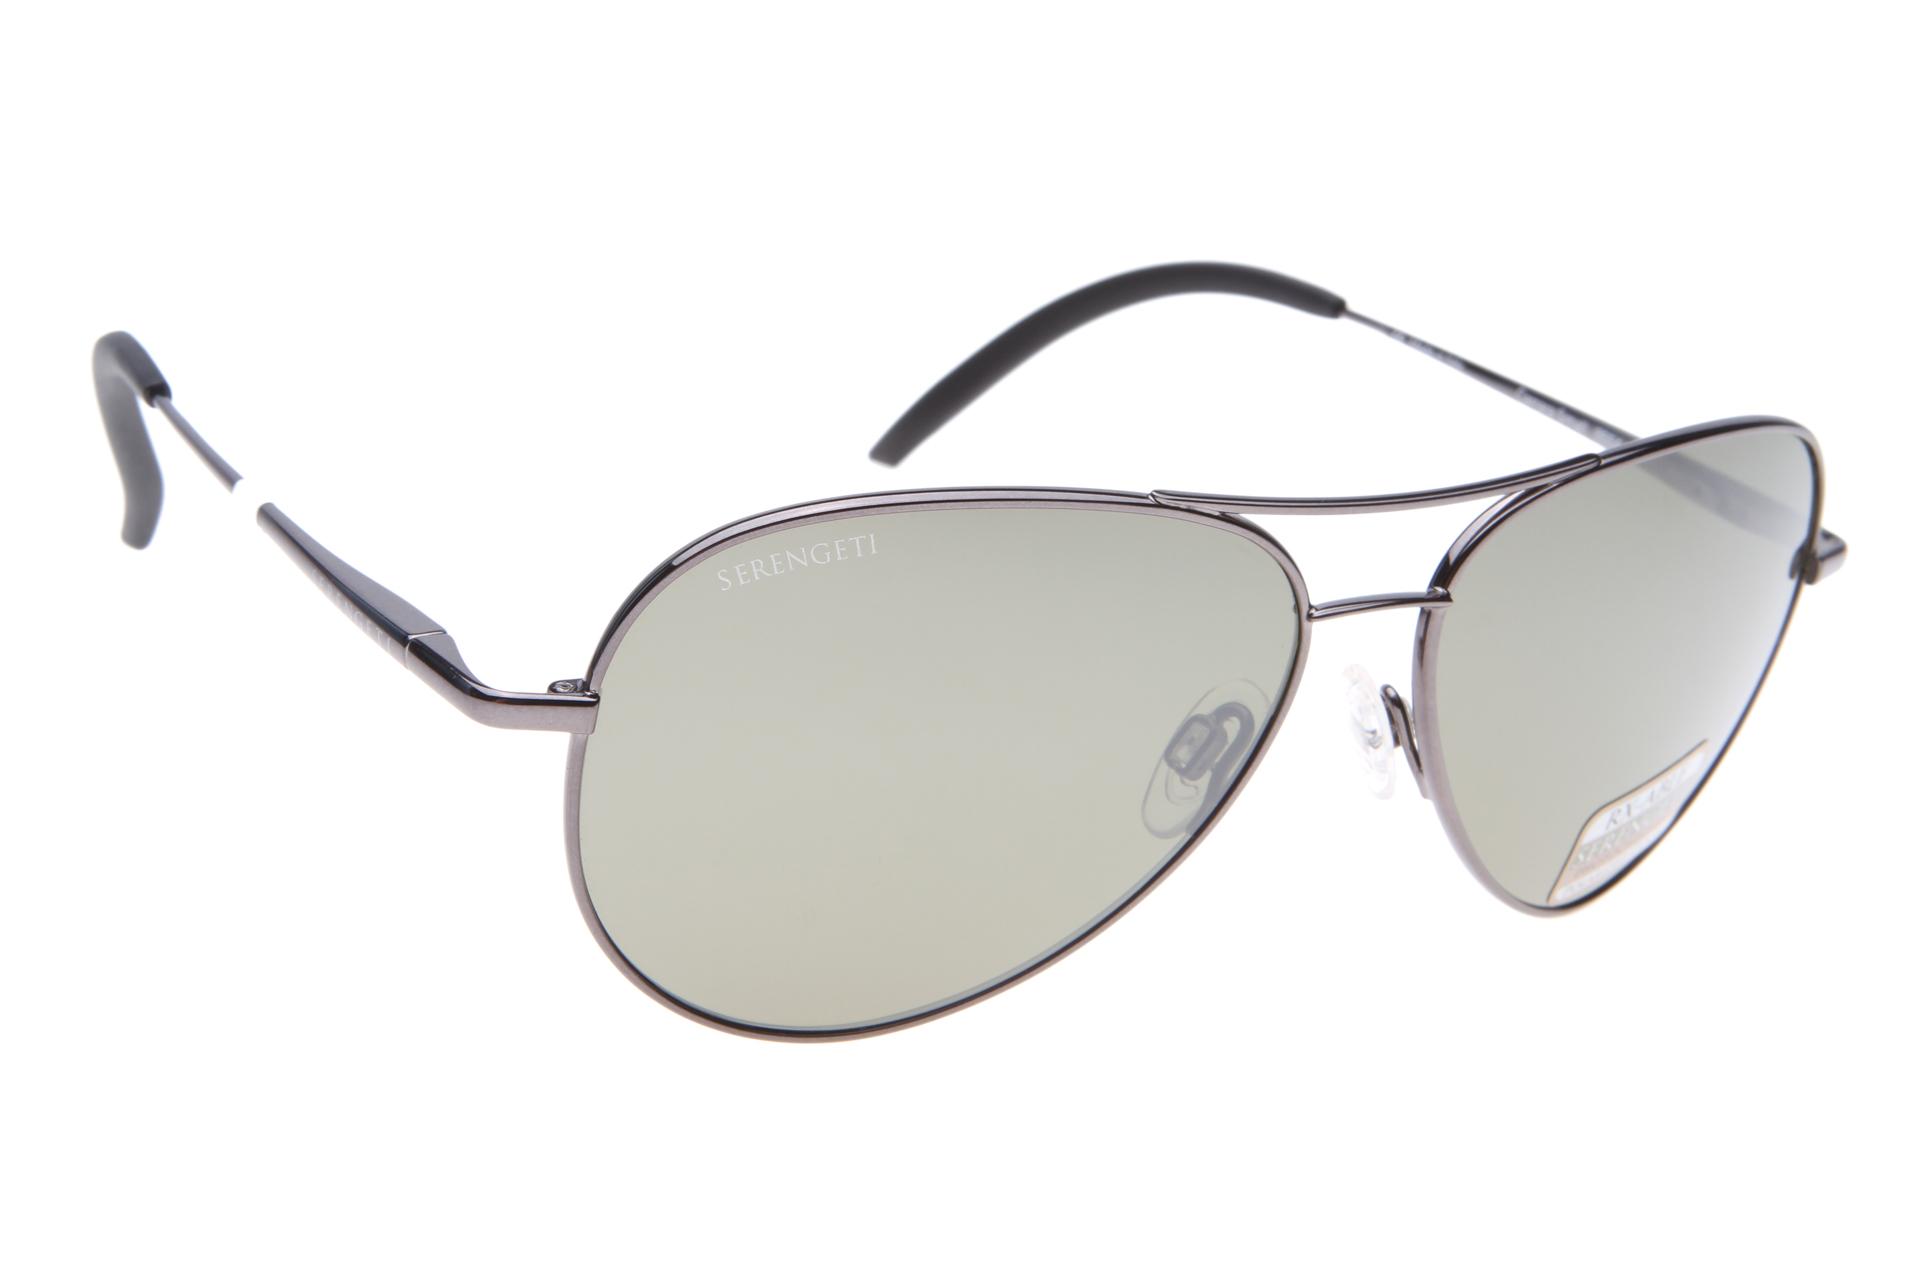 7646f7f29d4939 Serengeti Carrara Small 8554 (Shiny Gunmetal) Gepolariseerd zonnebril